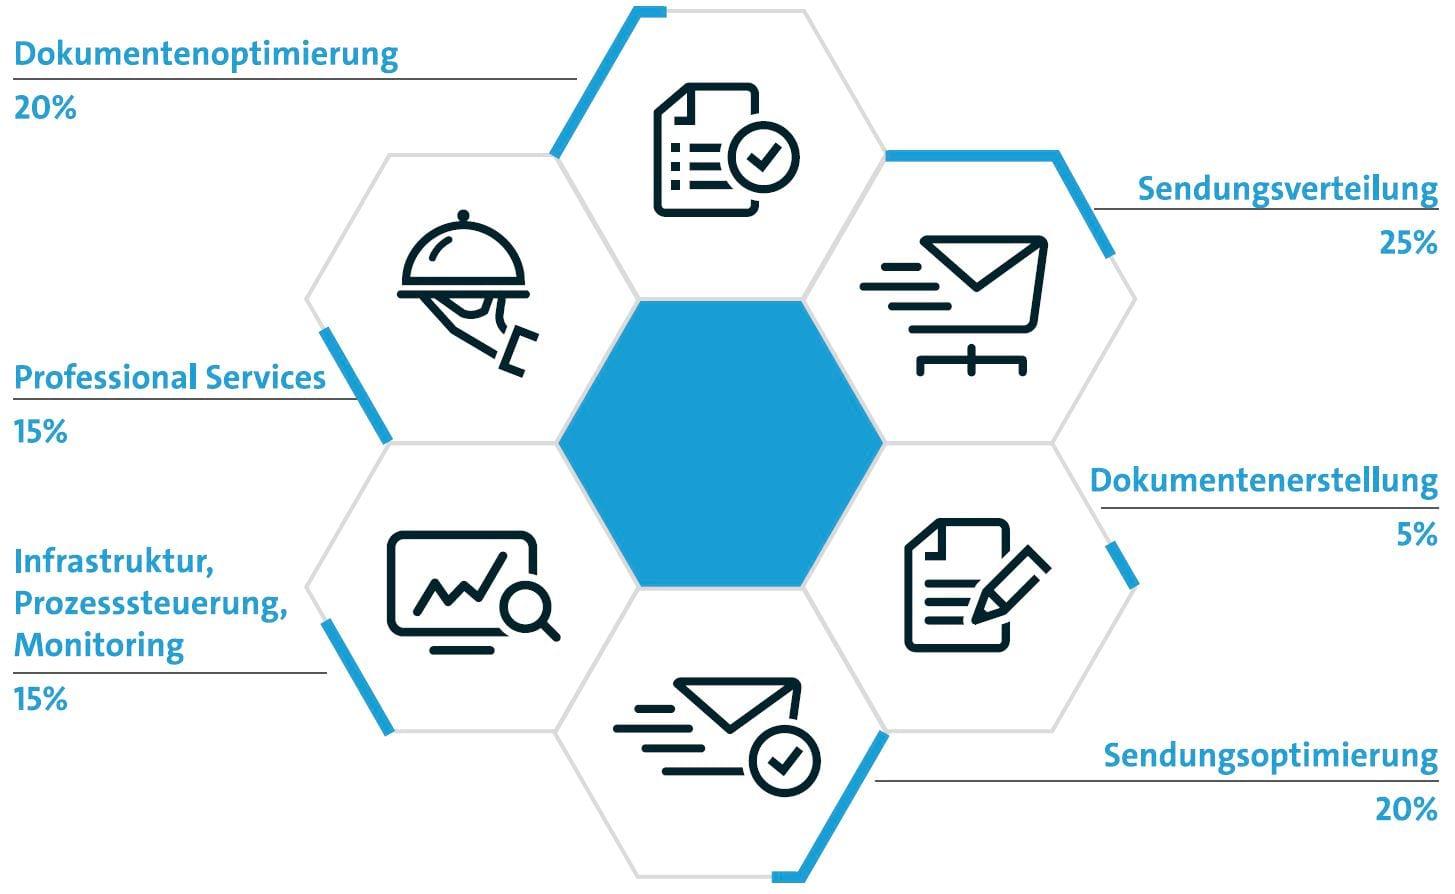 Bitkom Output Navigator - summ-it Unternehmensberatung